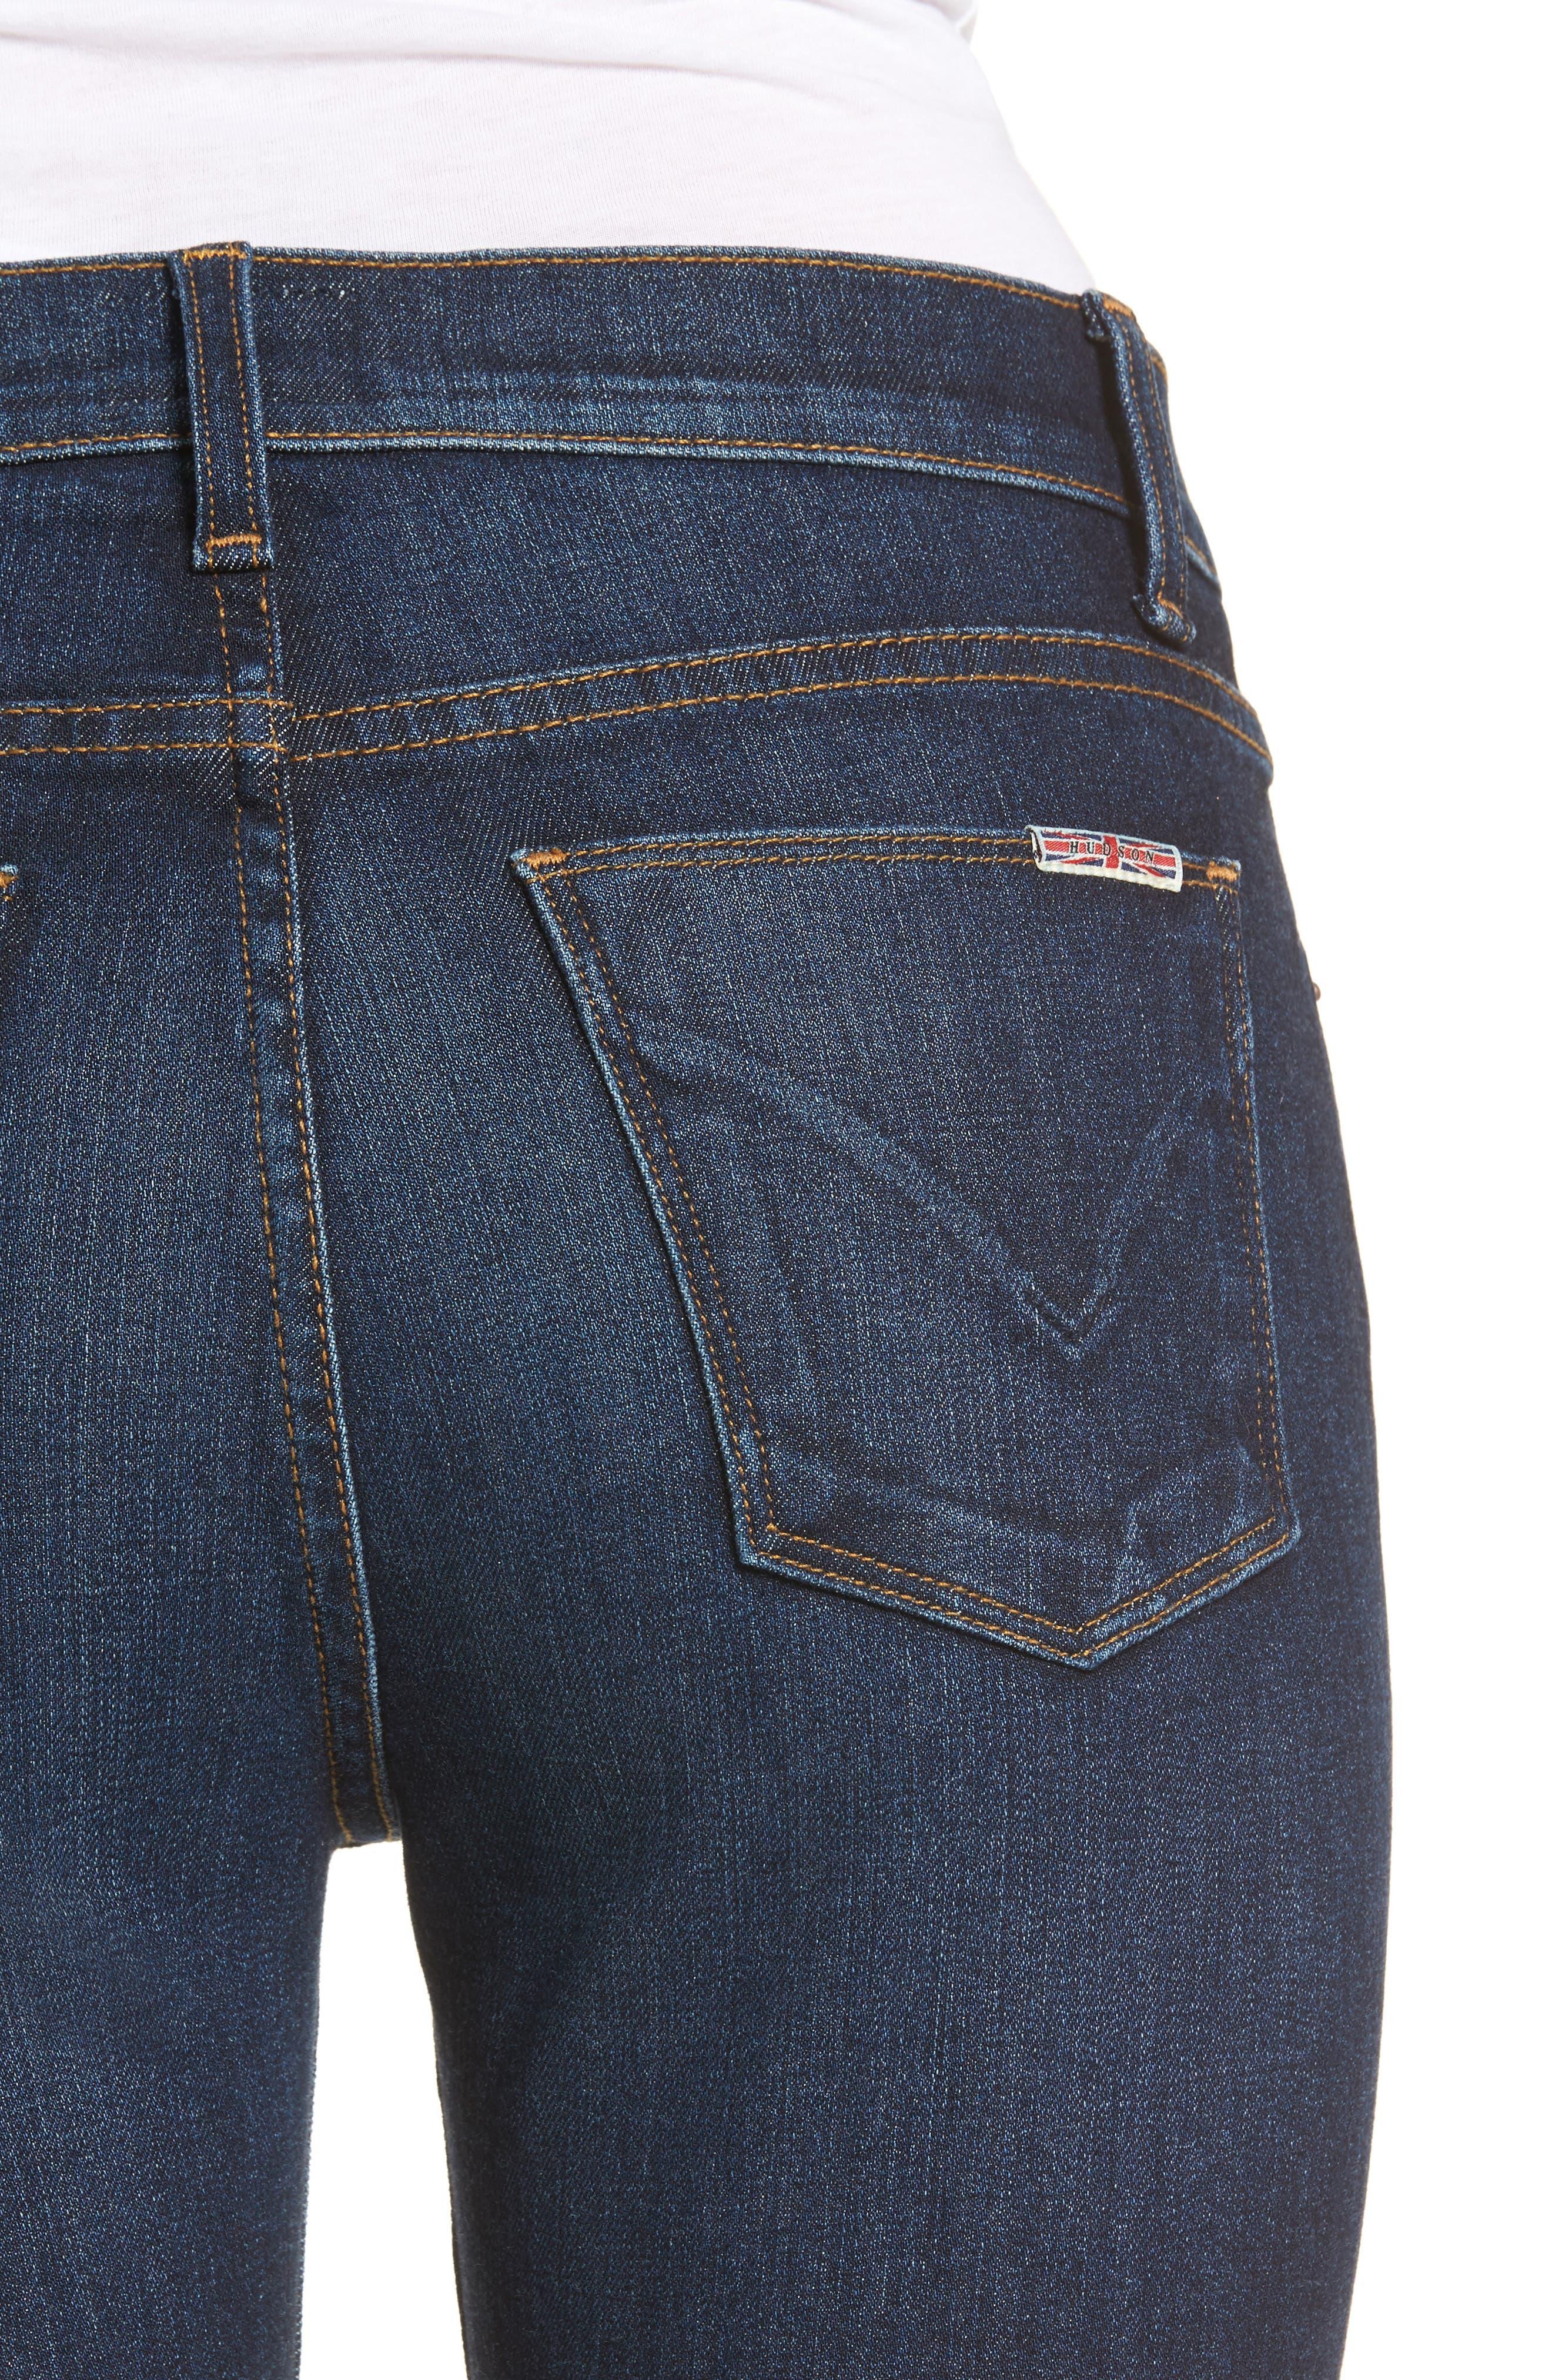 Barbara High Waist Ankle Super Skinny Jeans,                             Alternate thumbnail 4, color,                             Daze